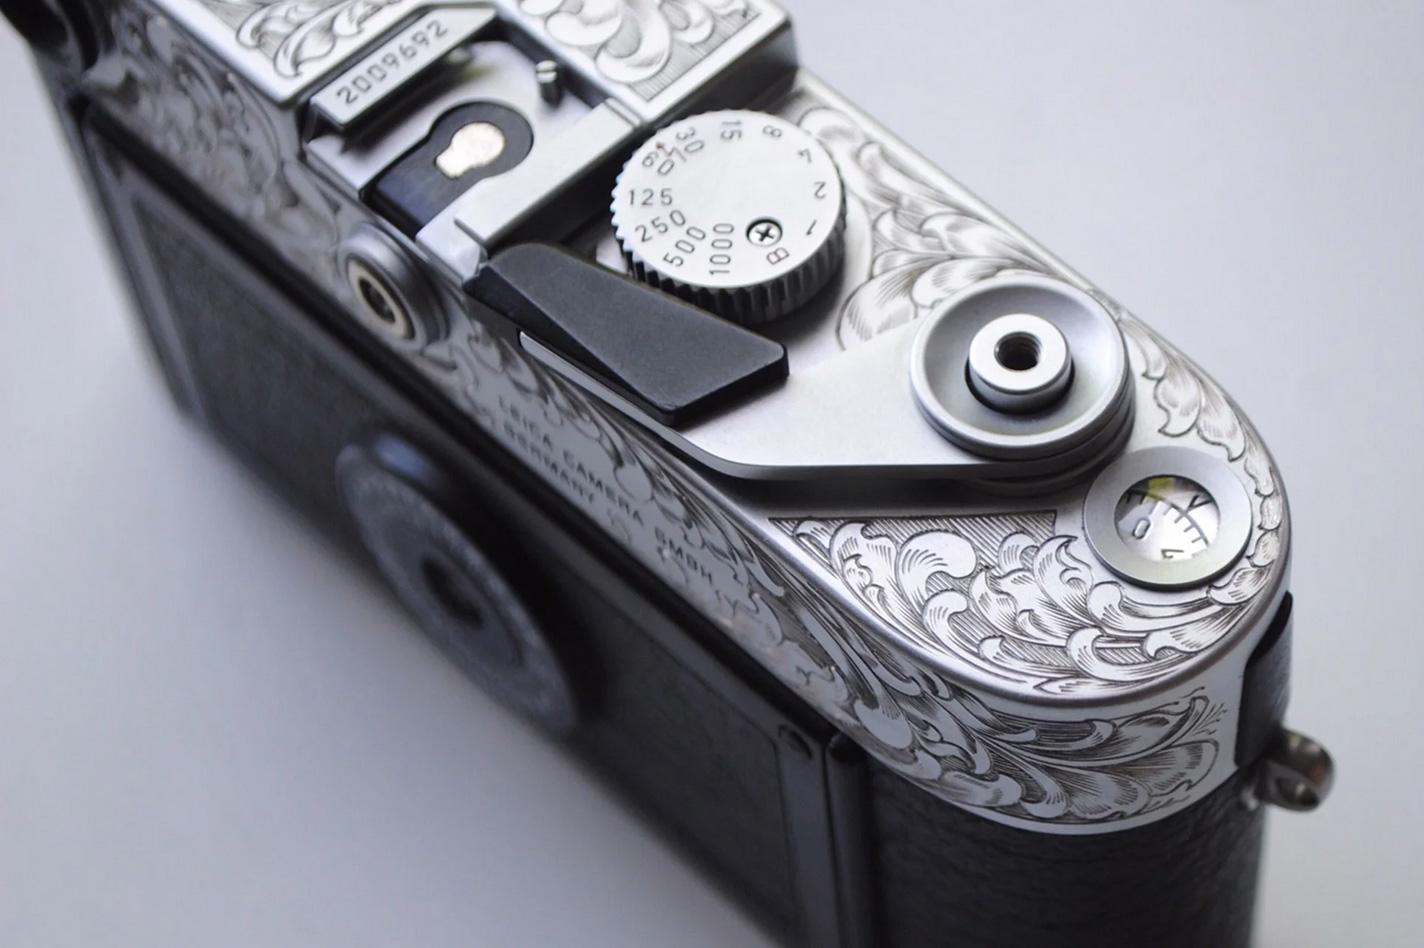 Engraved Leica M6